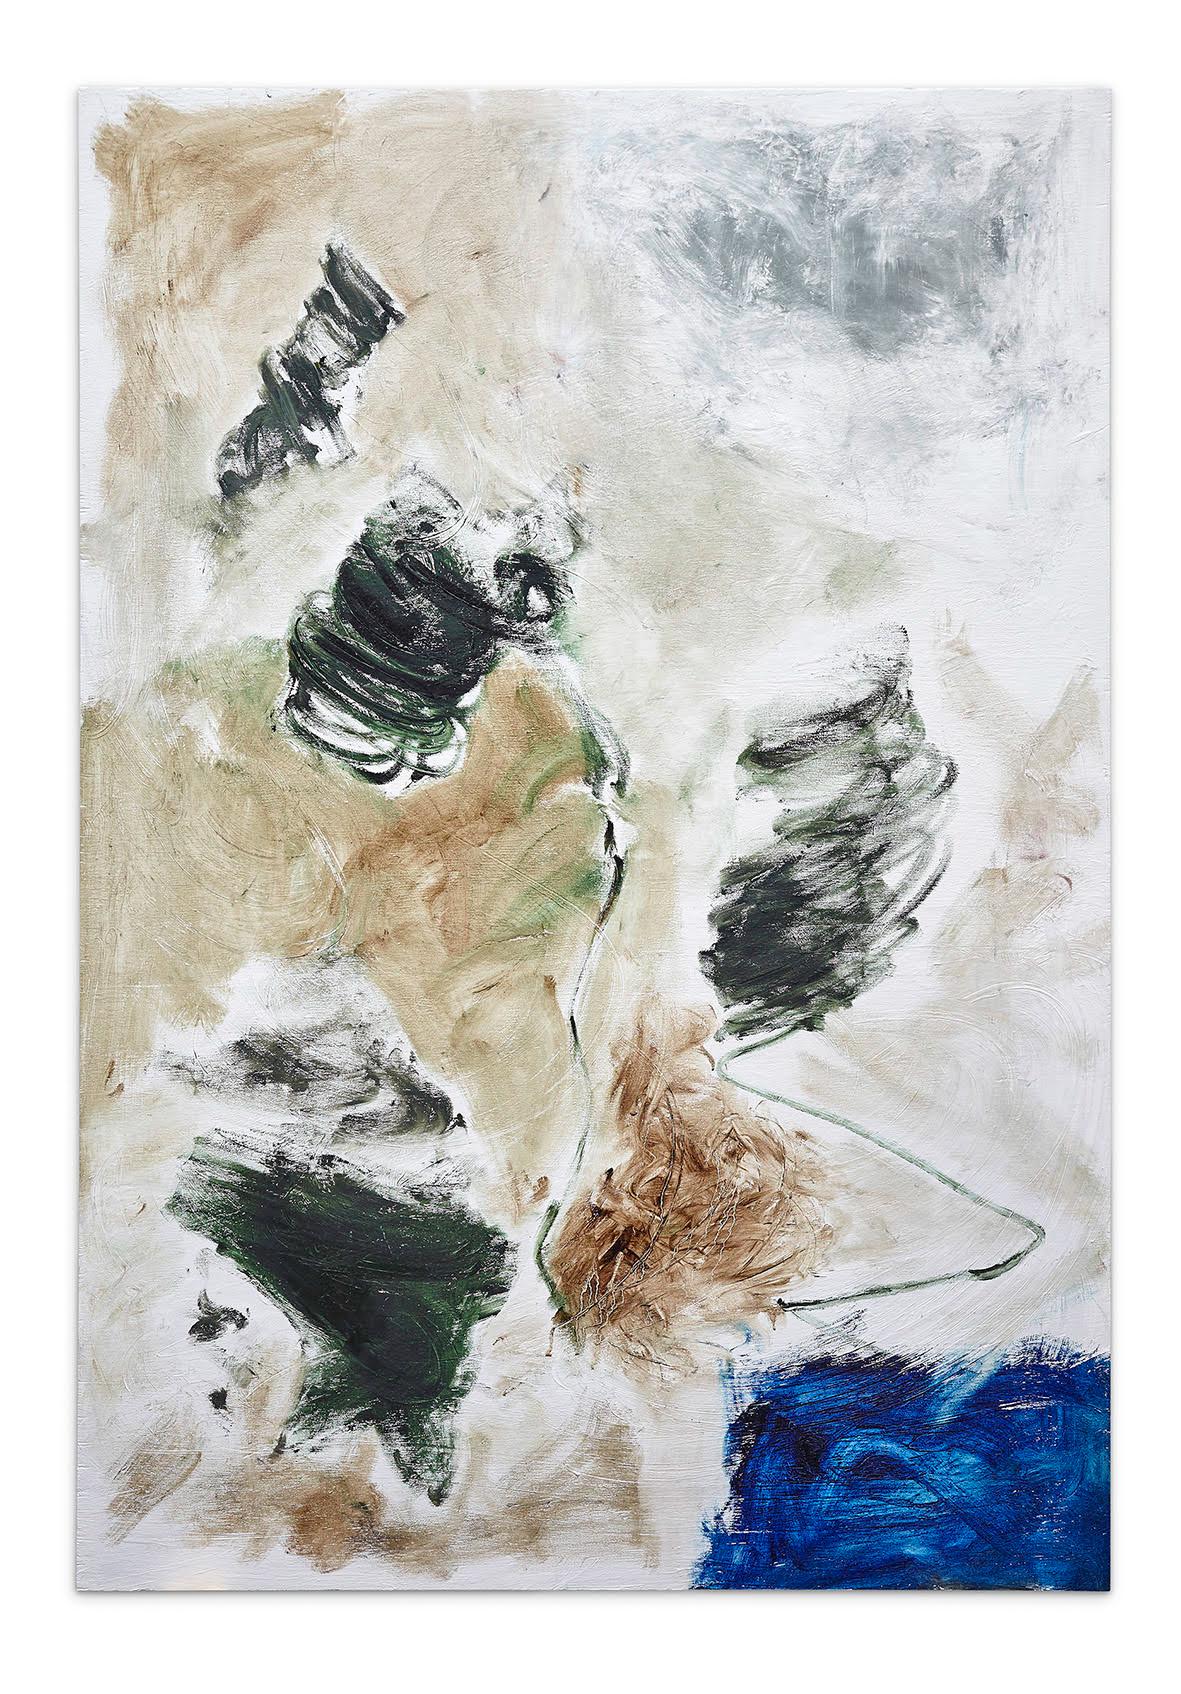 Joaquín Boz. <em>Untitled</em>, 2017. Oil on panel, 53 x 37 1/2 inches (134.6 x 95.3 cm)